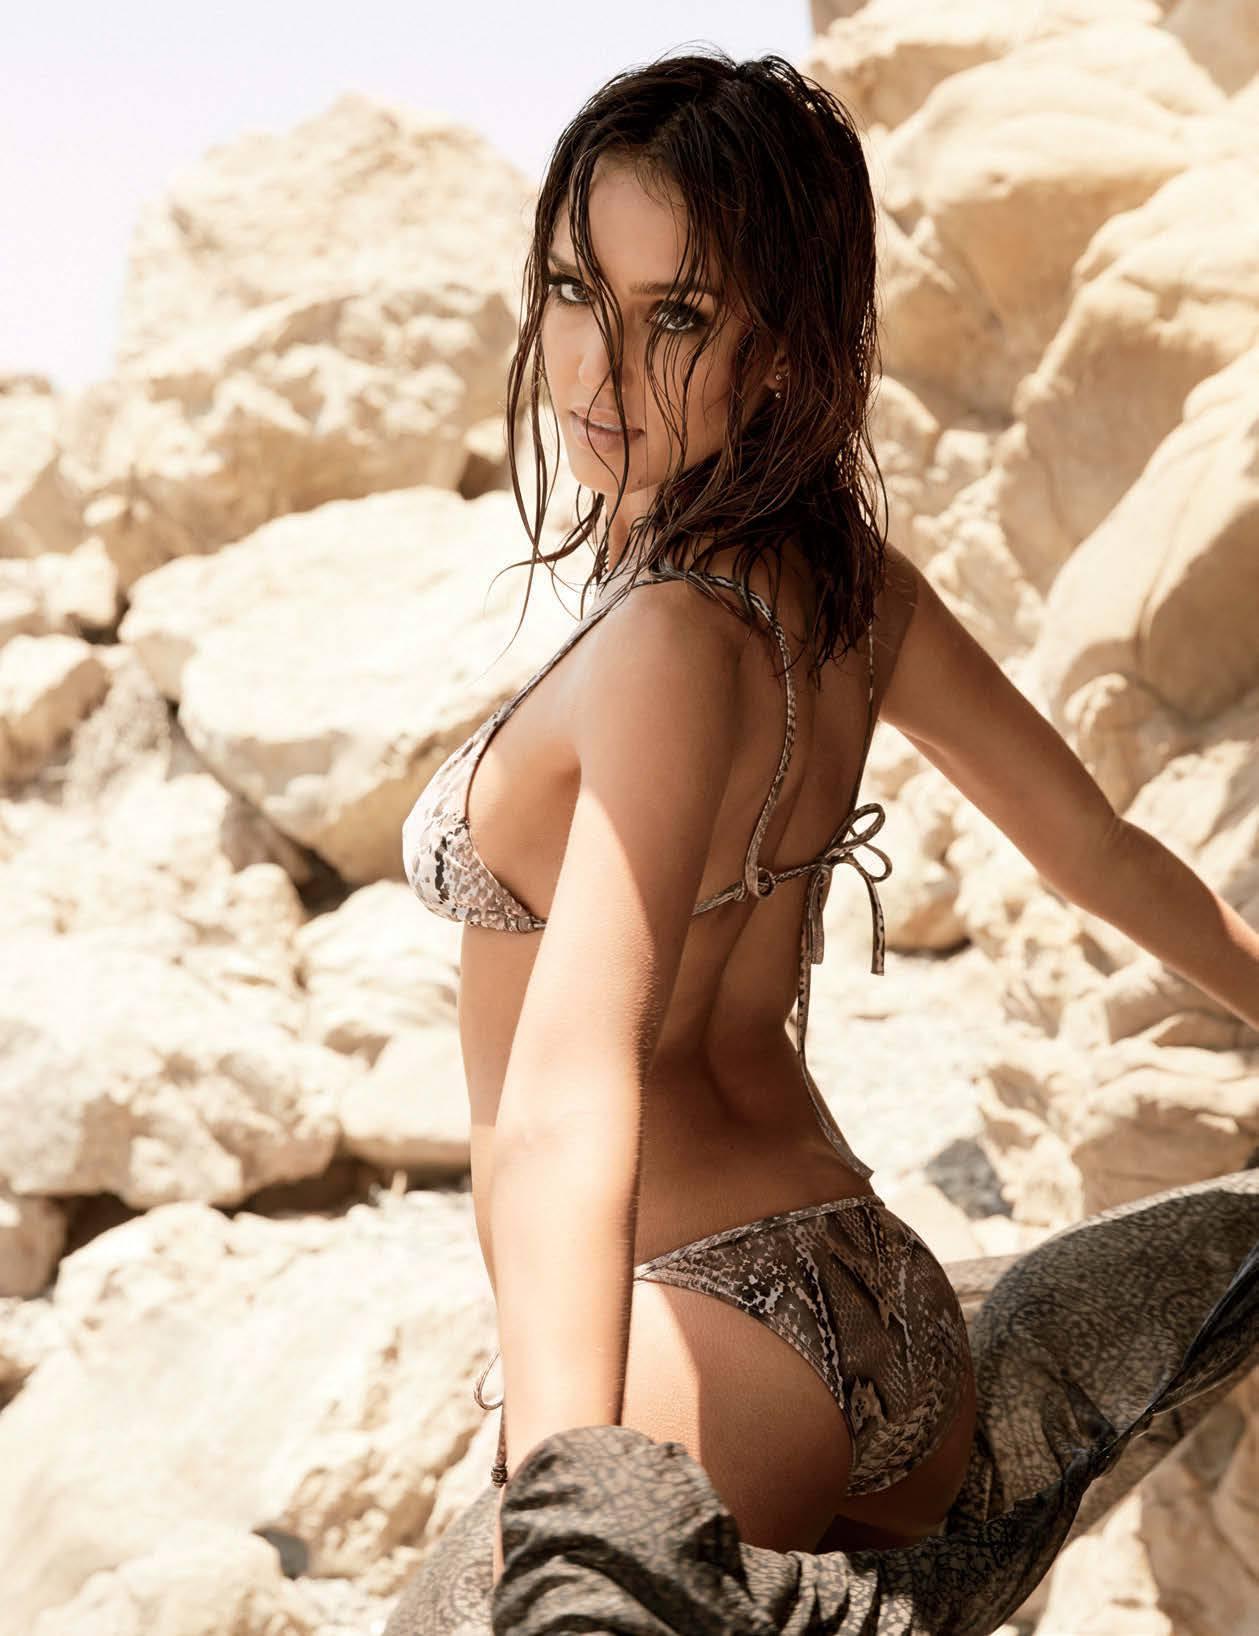 Jessica Alba – Beautiful Body In Sexy Photoshoot For Maxim Magazine (september 2014) (hq) 0010